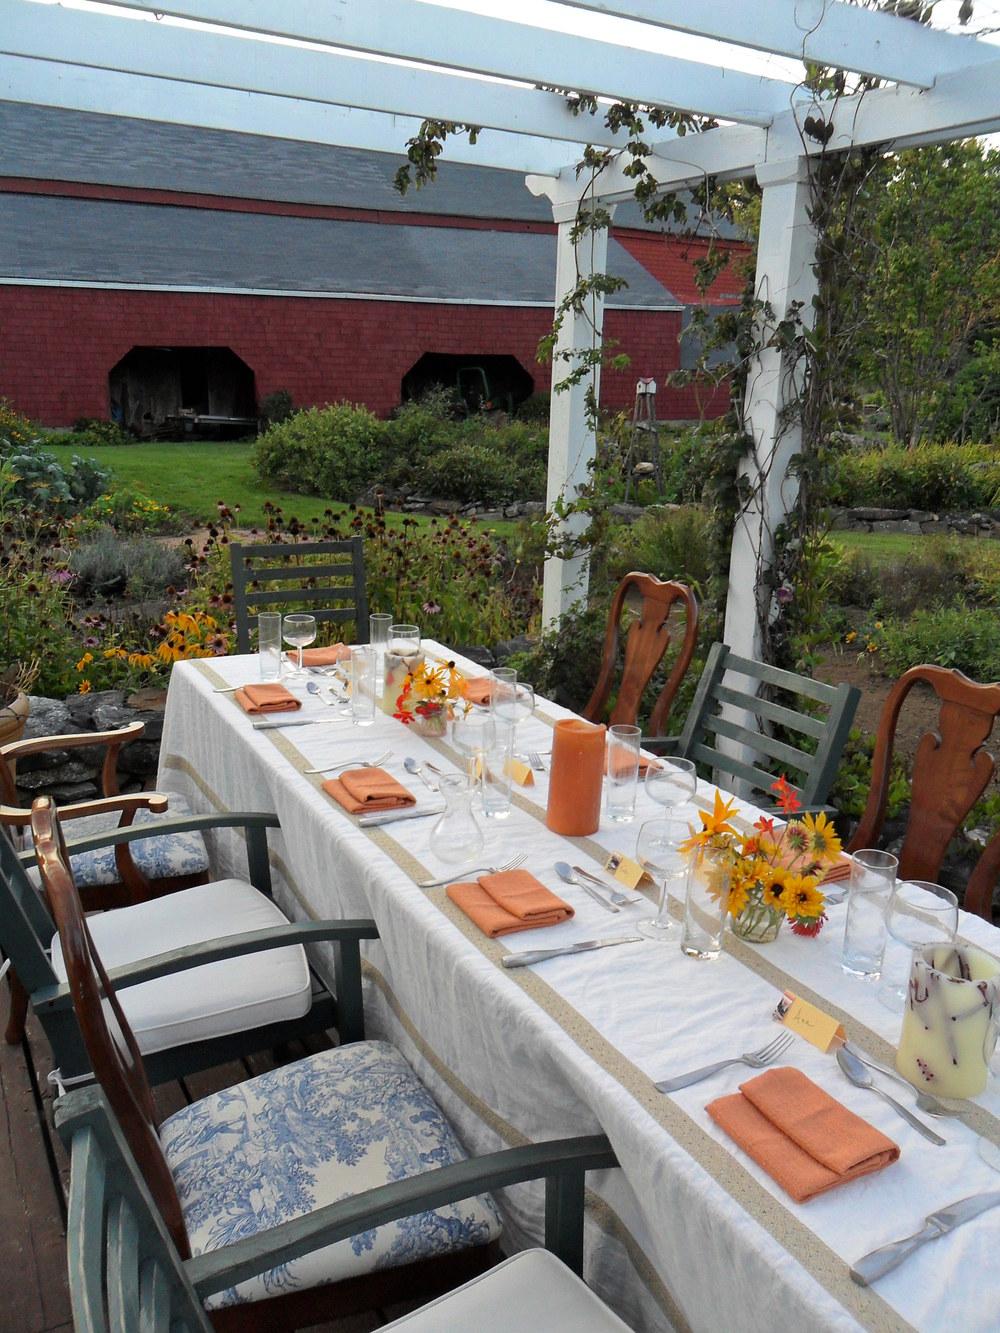 A farm-to-table dinner at a homestead in coastal Maine